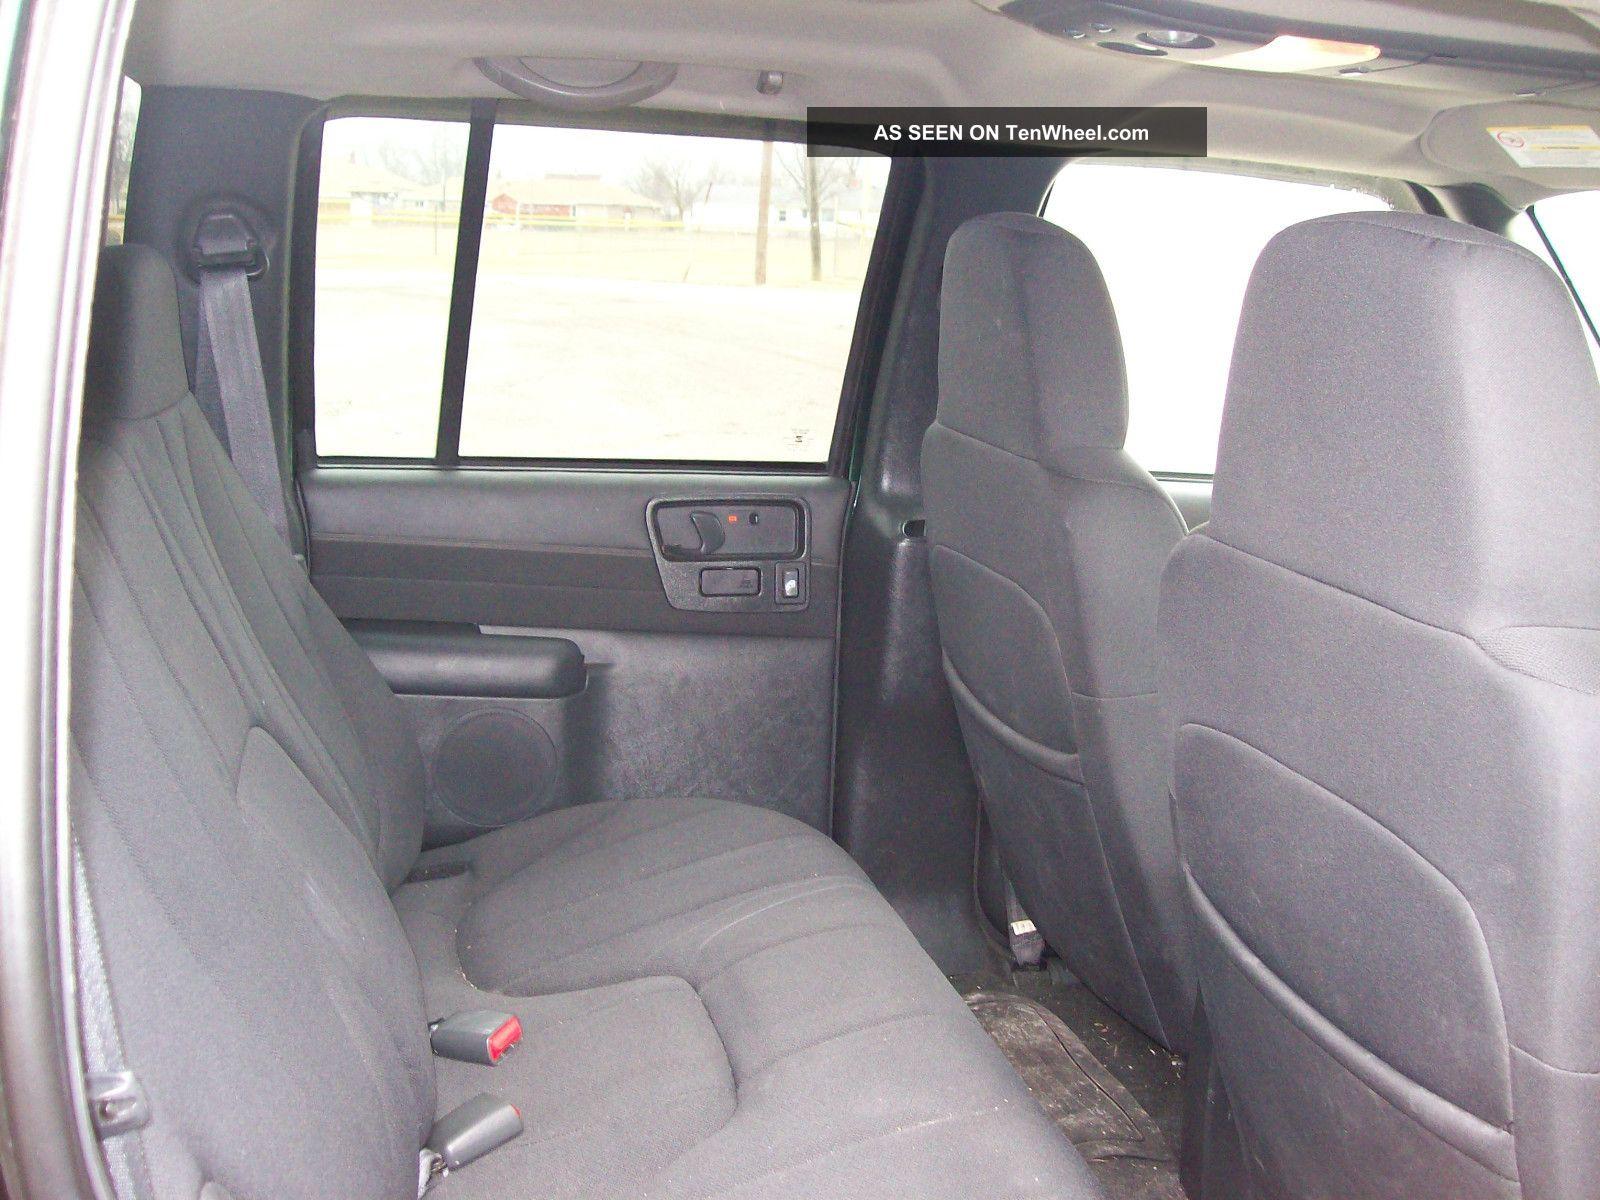 2004 Gmc Sonoma Sls Crew Cab Pickup 4 Door 4. 3l 4x4 Sonoma photo 6 #71695A